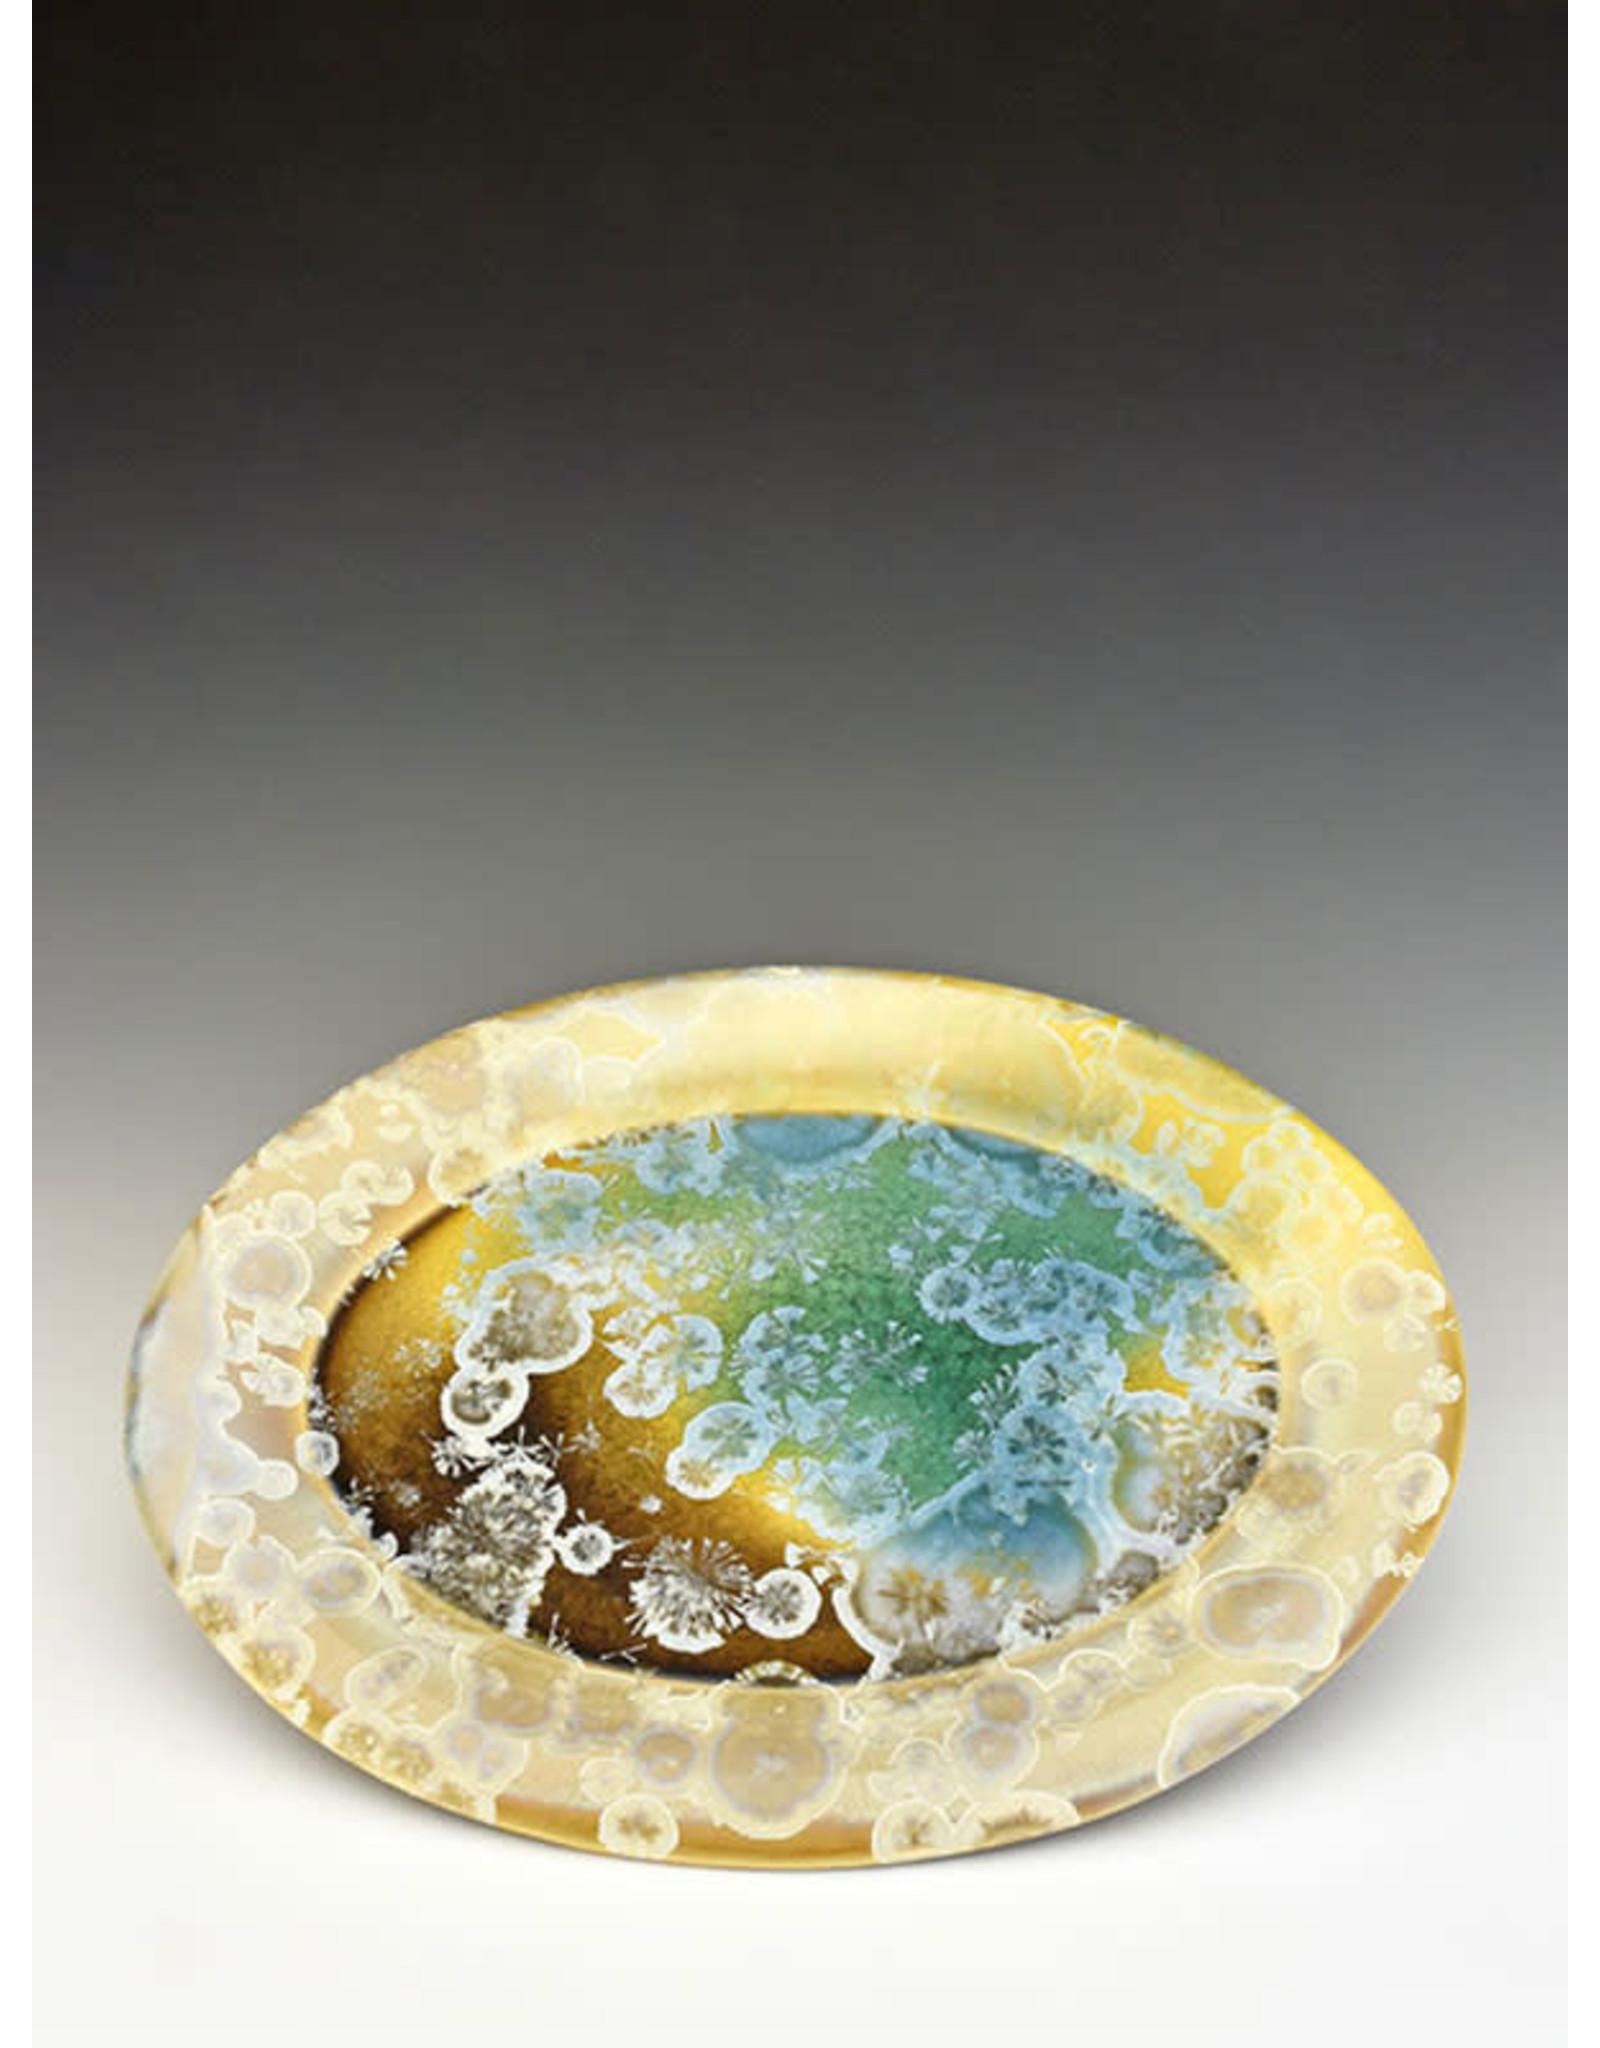 Stellar Art Pottery Stellar Art Pottery Oval Platter